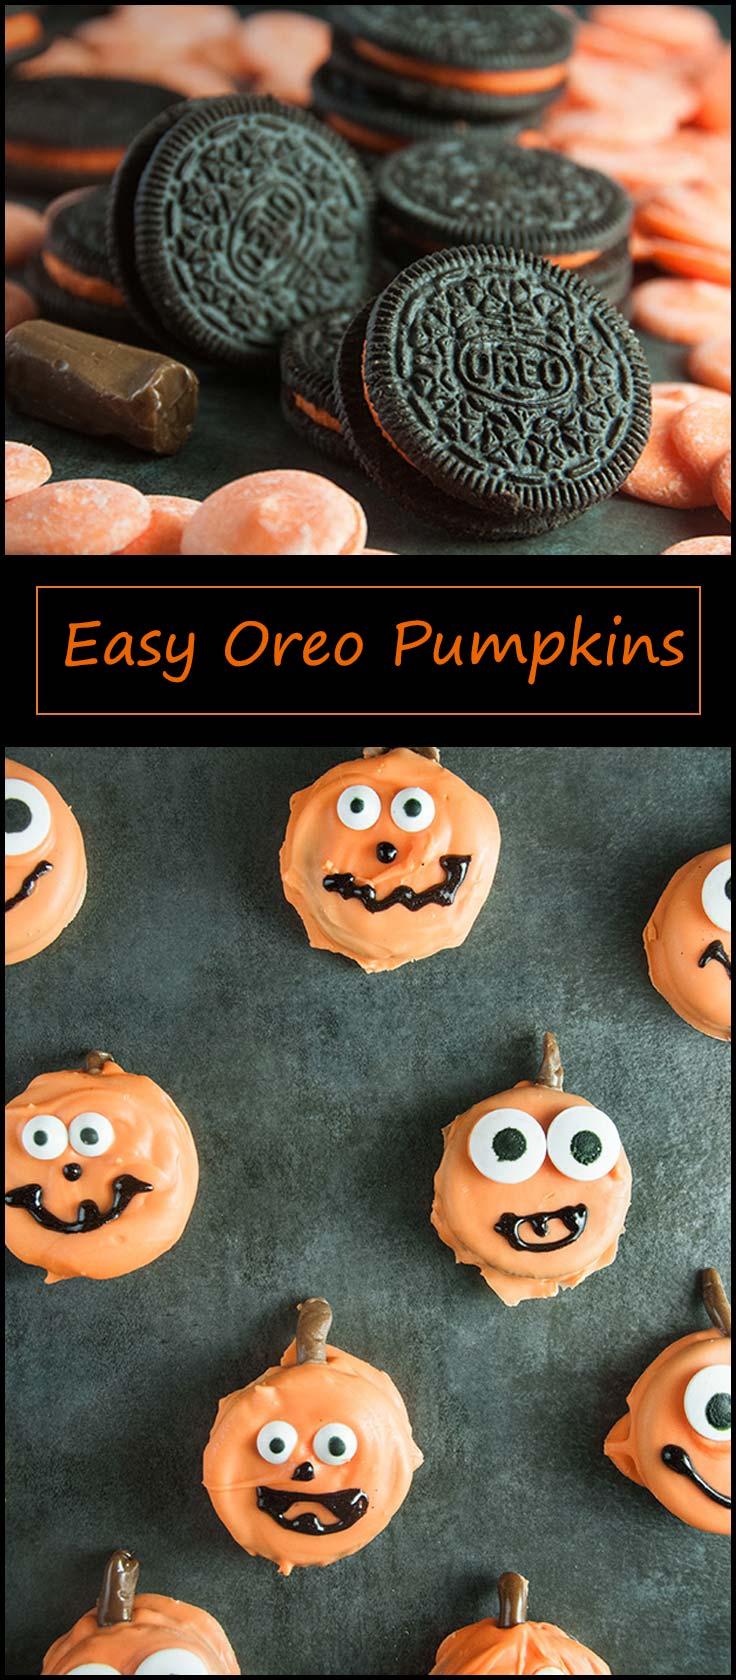 Easy Pumpkin Oreos from www.seasonedsprinkles.com